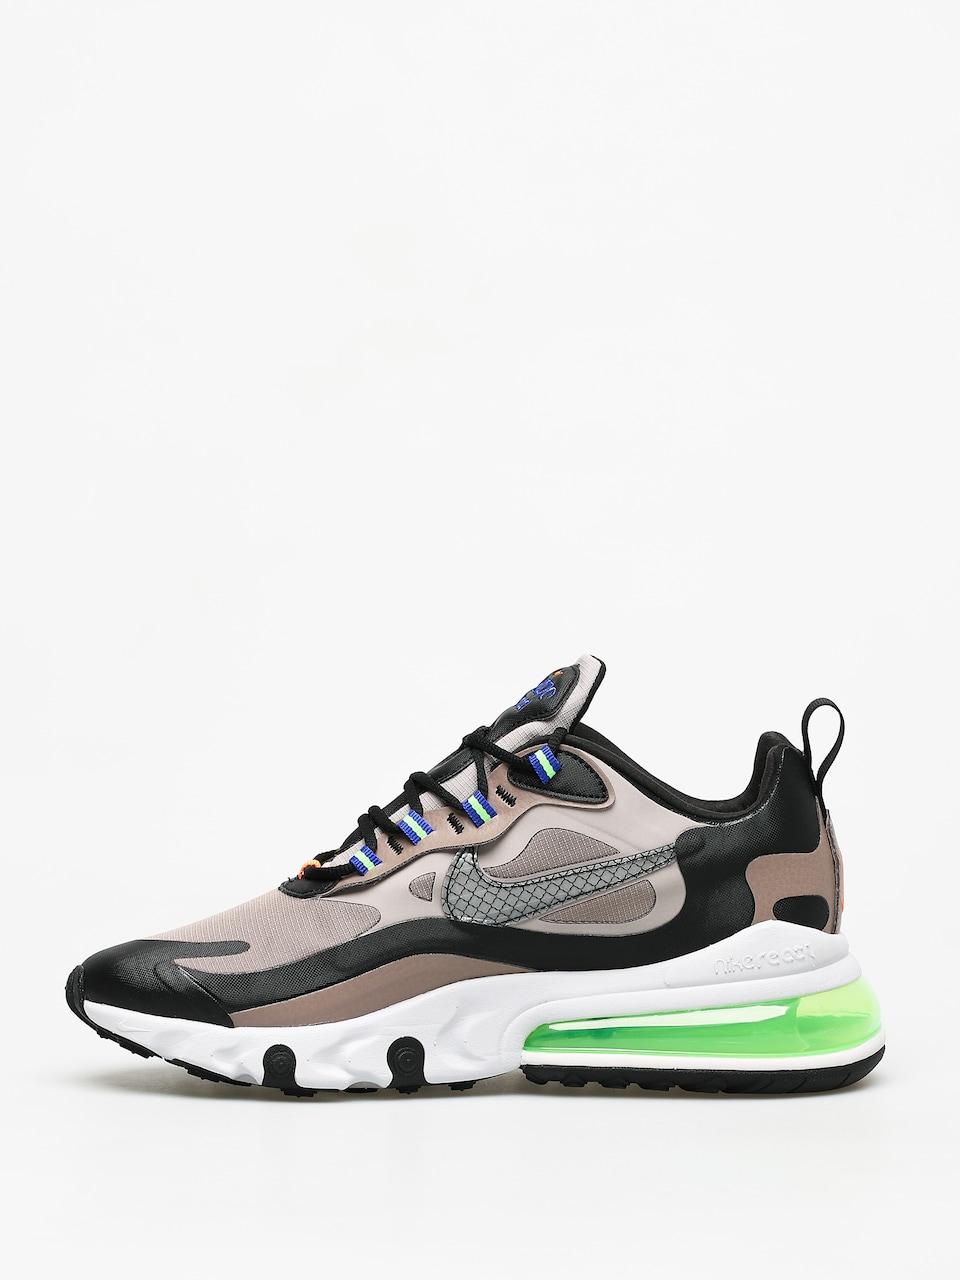 Buty Nike Air Max 270 React Wtr (sepia stoneblack moon particle)